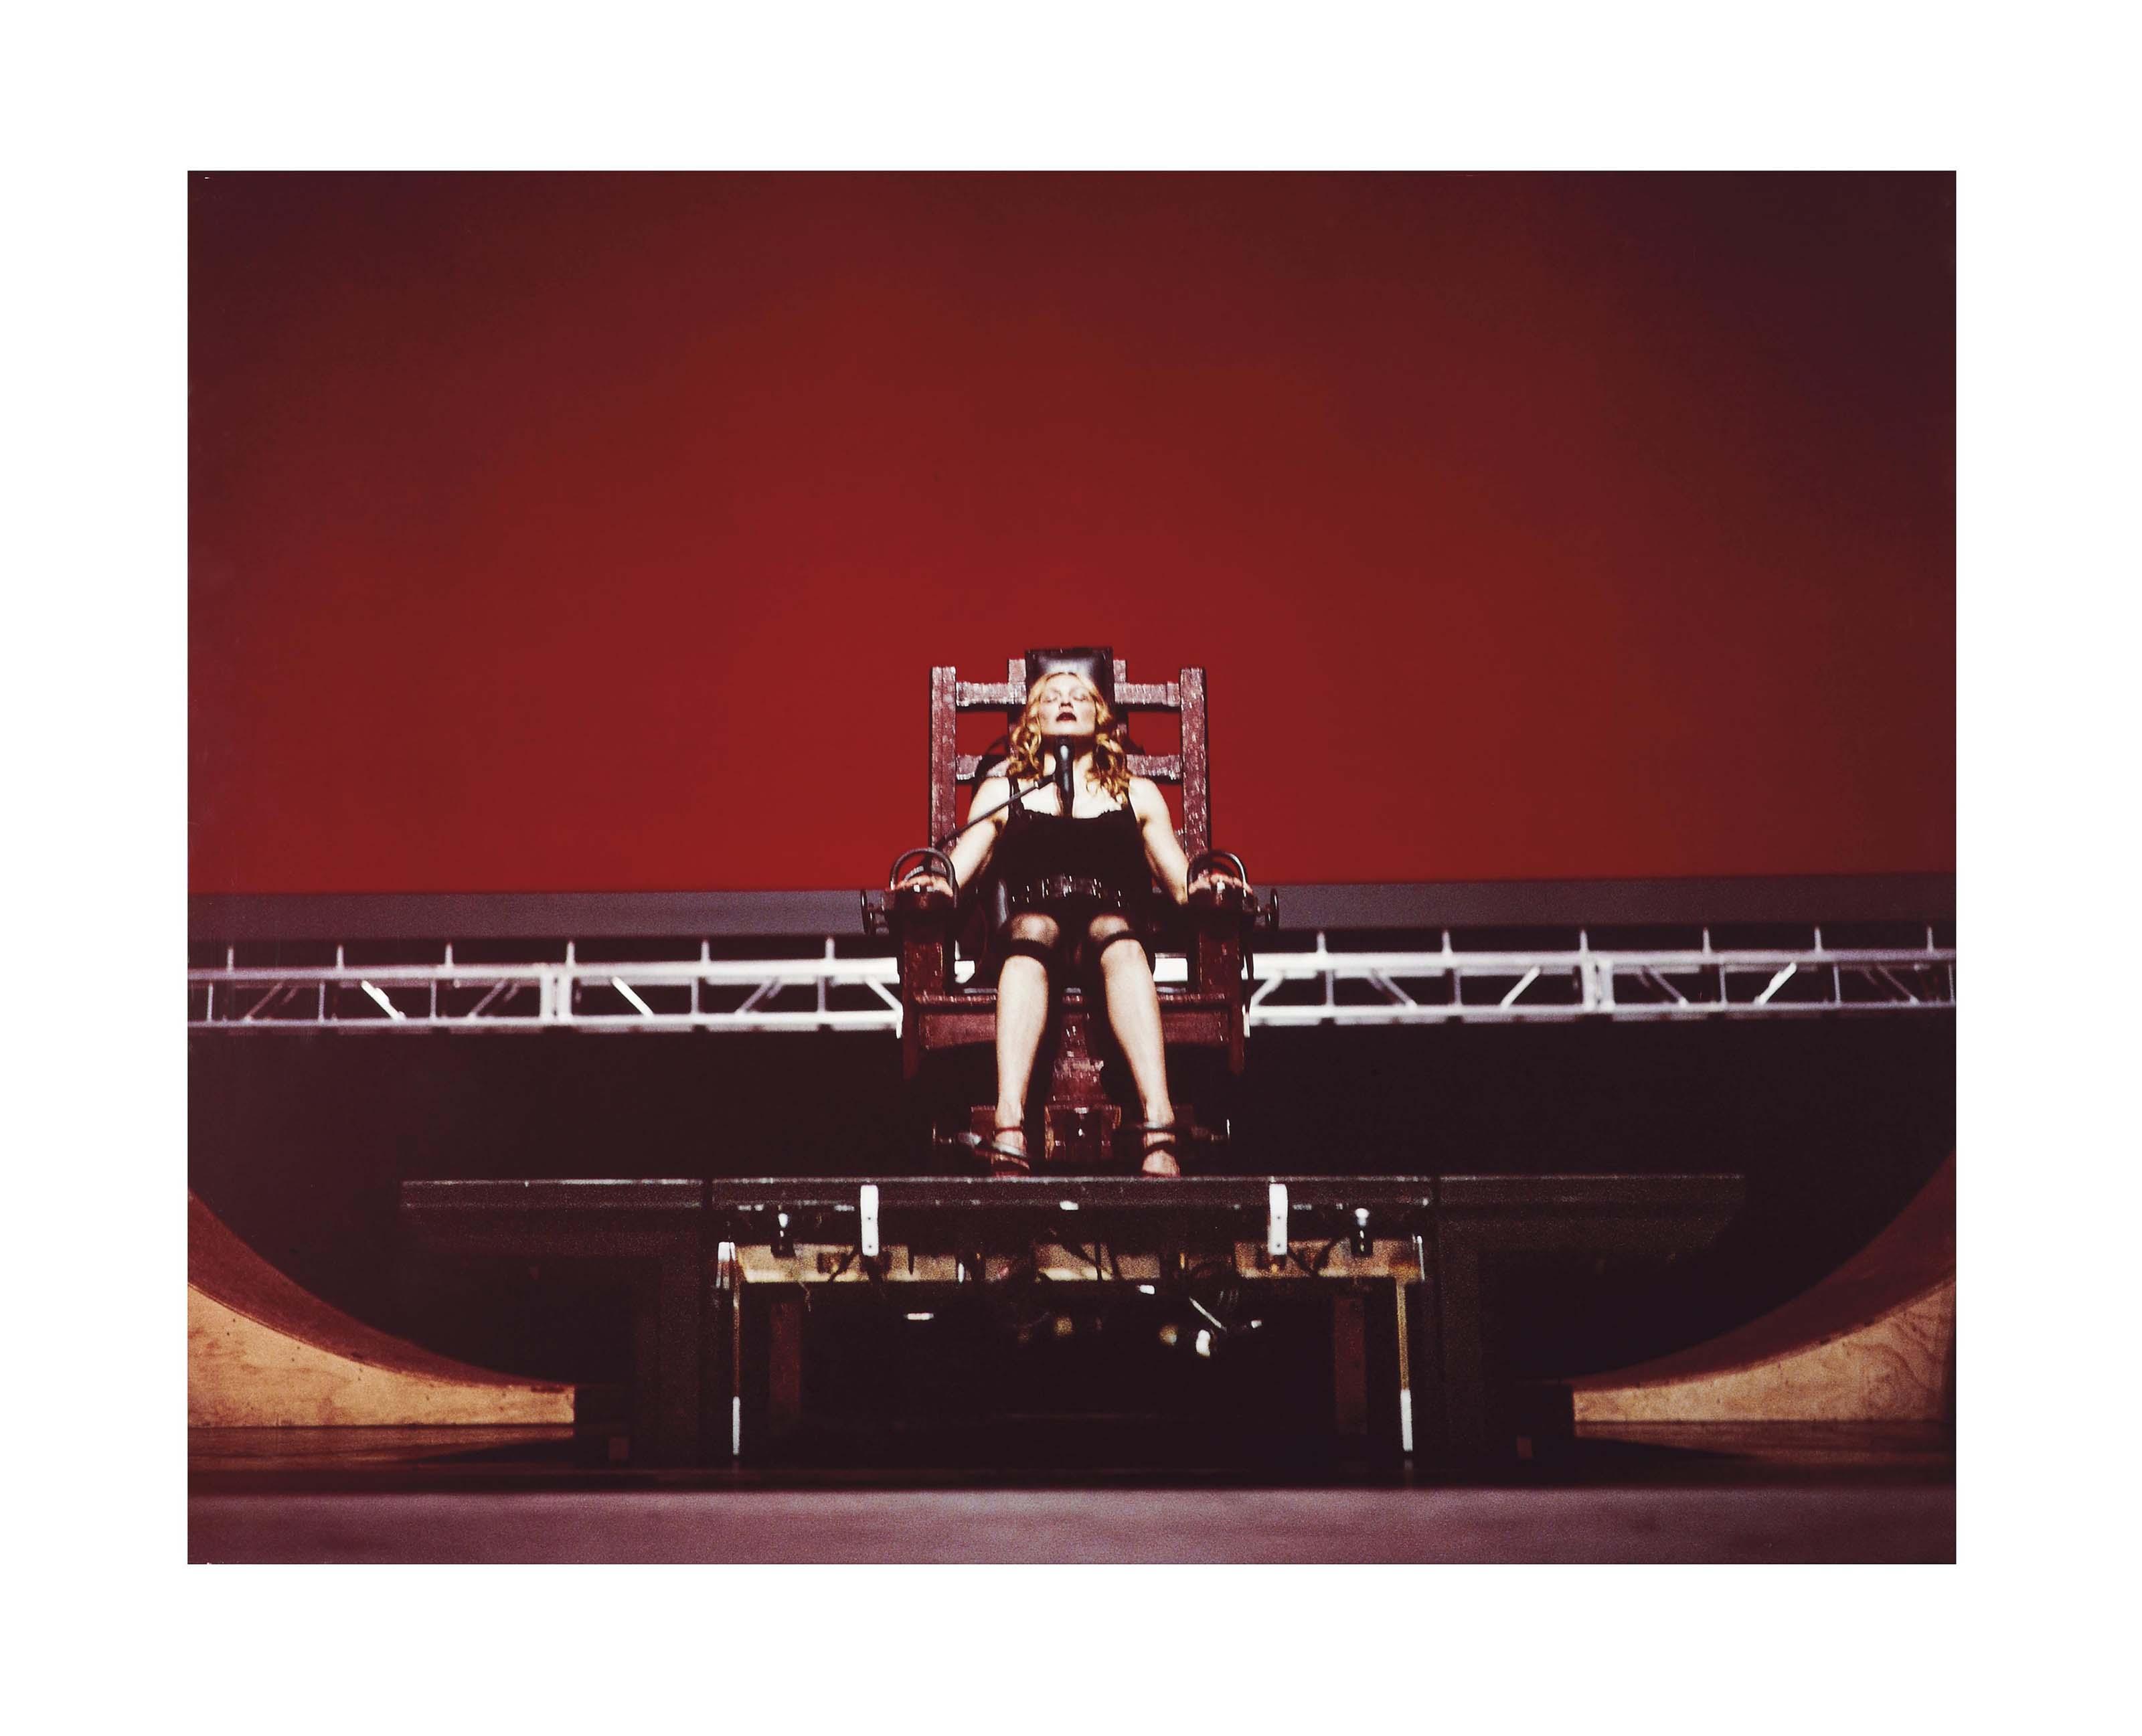 MADONNA, RE-INVENTION TOUR, 2004